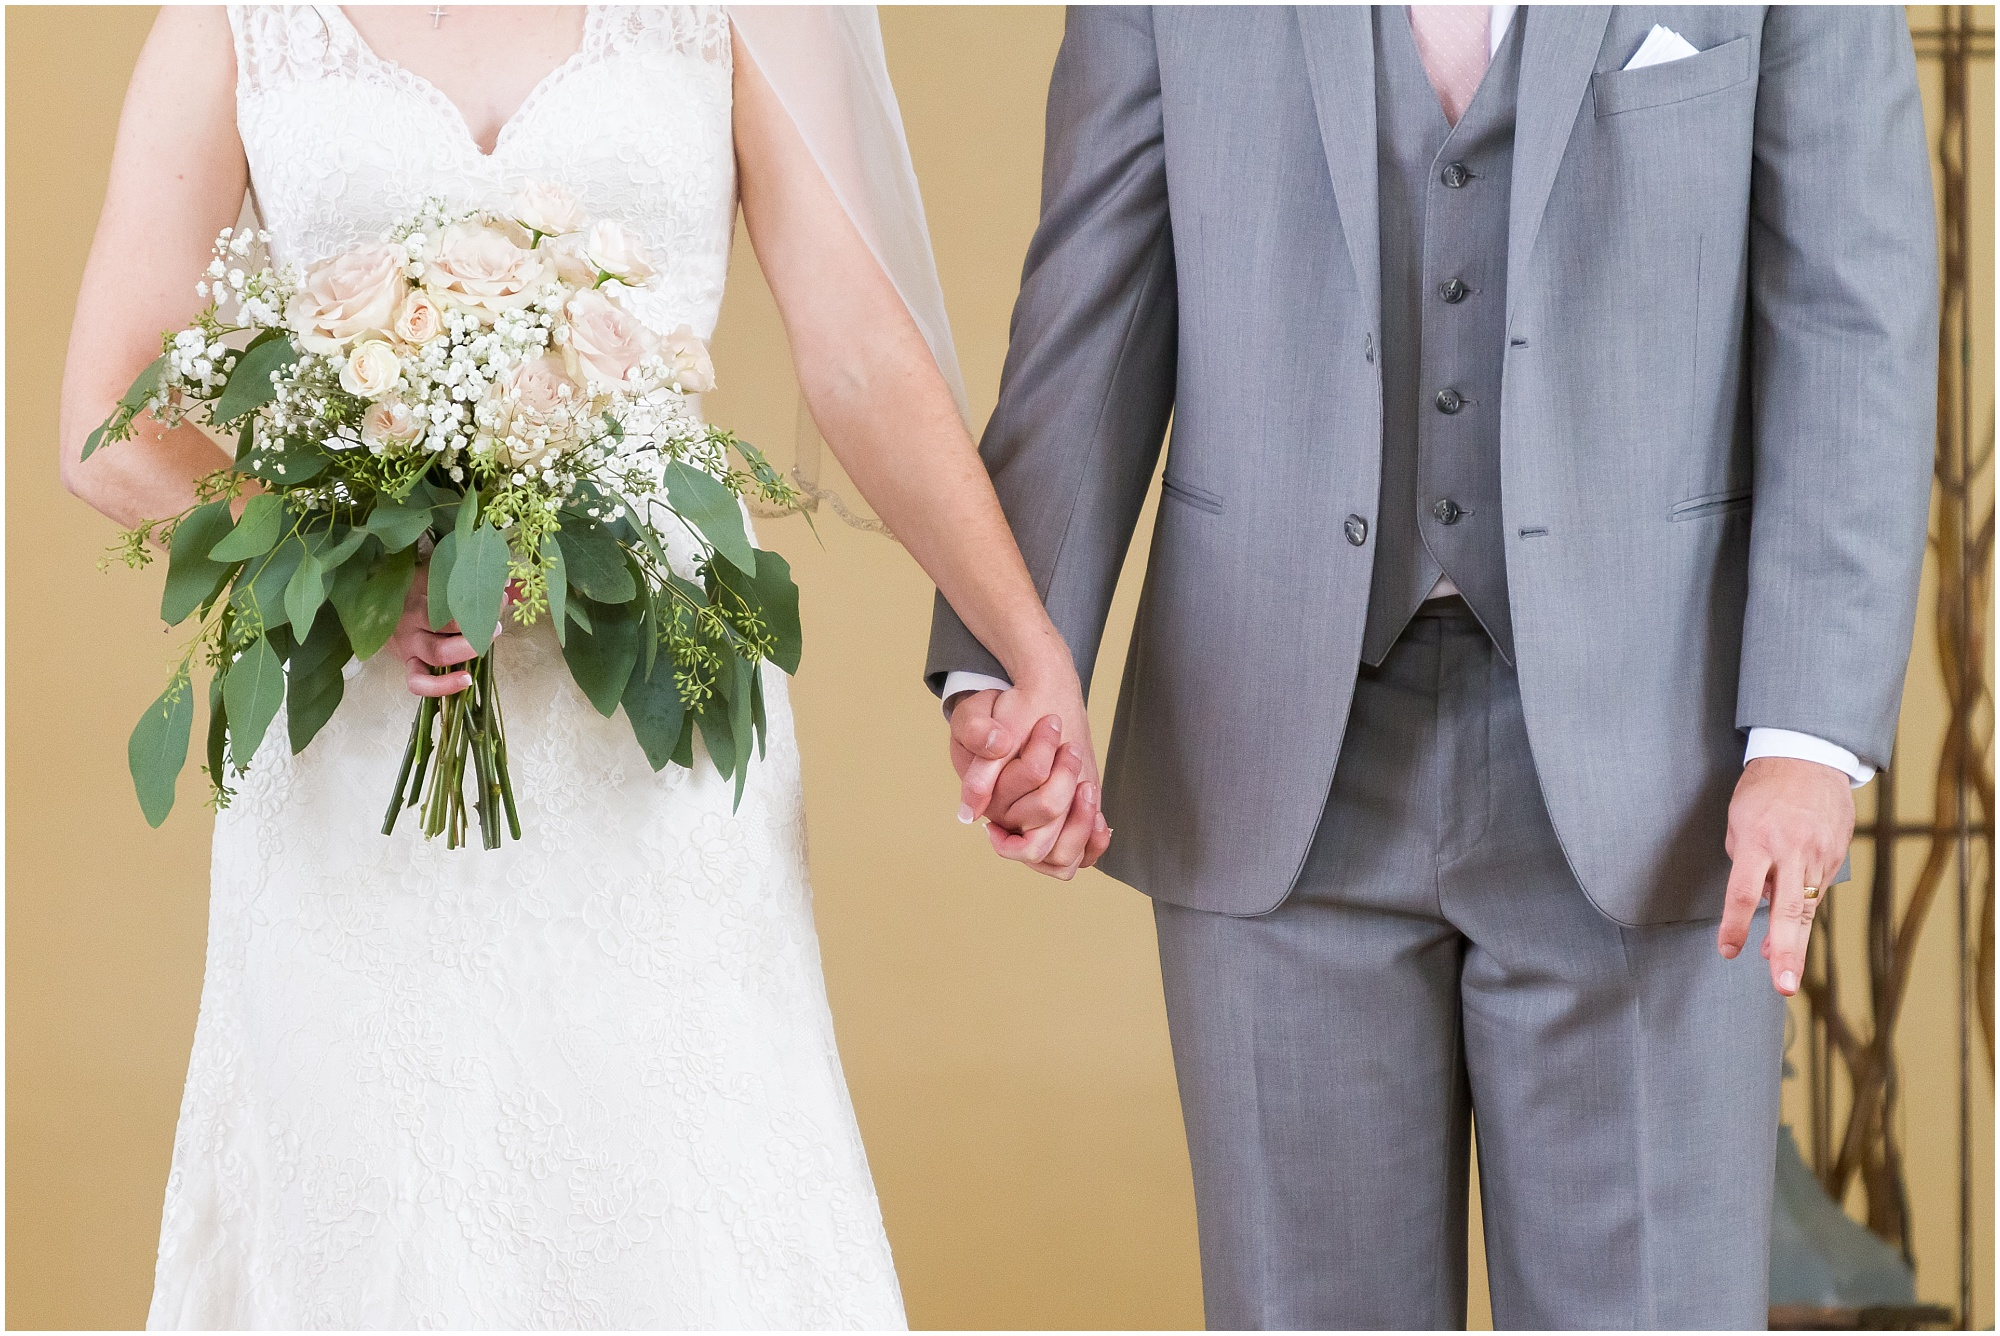 Classic church wedding at The Chapel at Meyer Center in Waco, Texas - Jason & Melaina Photography - www.jasonandmelaina.com